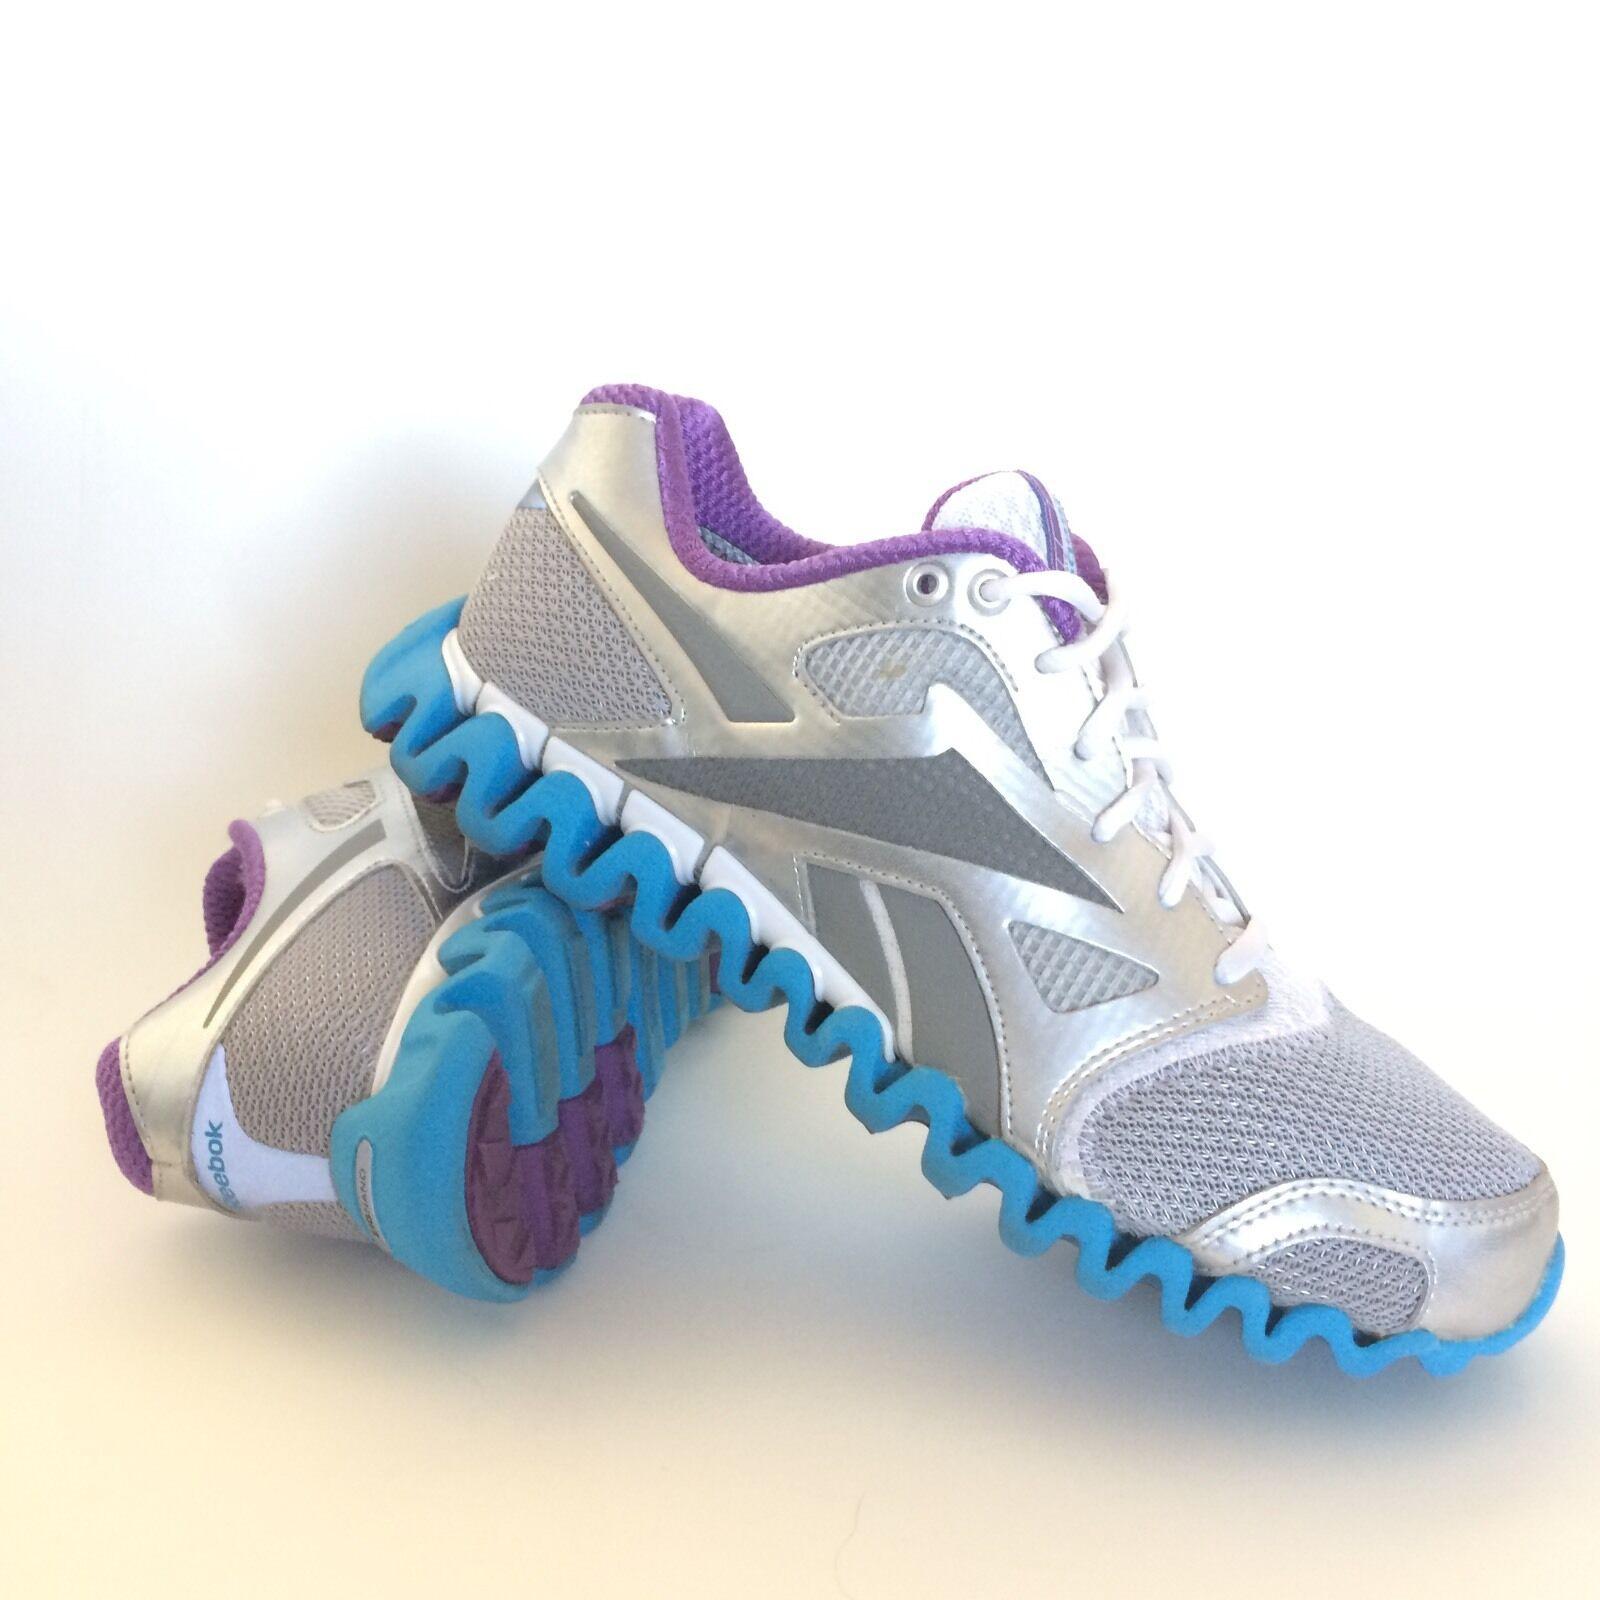 Reebok Zignano Fly 2 Womens Running Shoes Size 9 Silver Purple